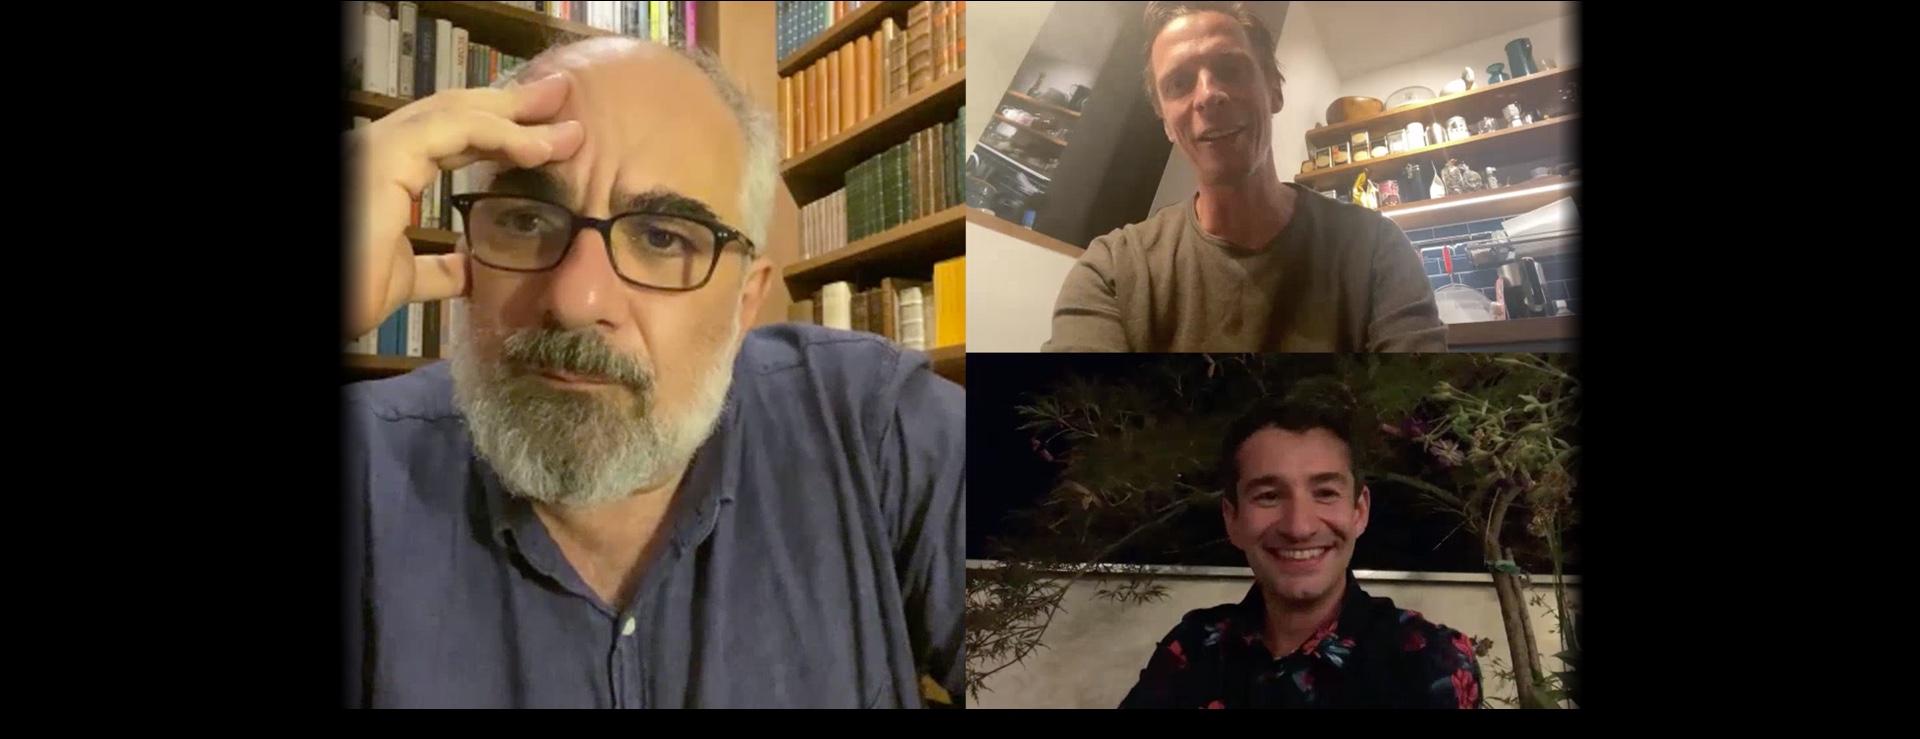 Eckel & Niavarani & Sarsam - Wenn 3 Idioten versuchen zu skypen